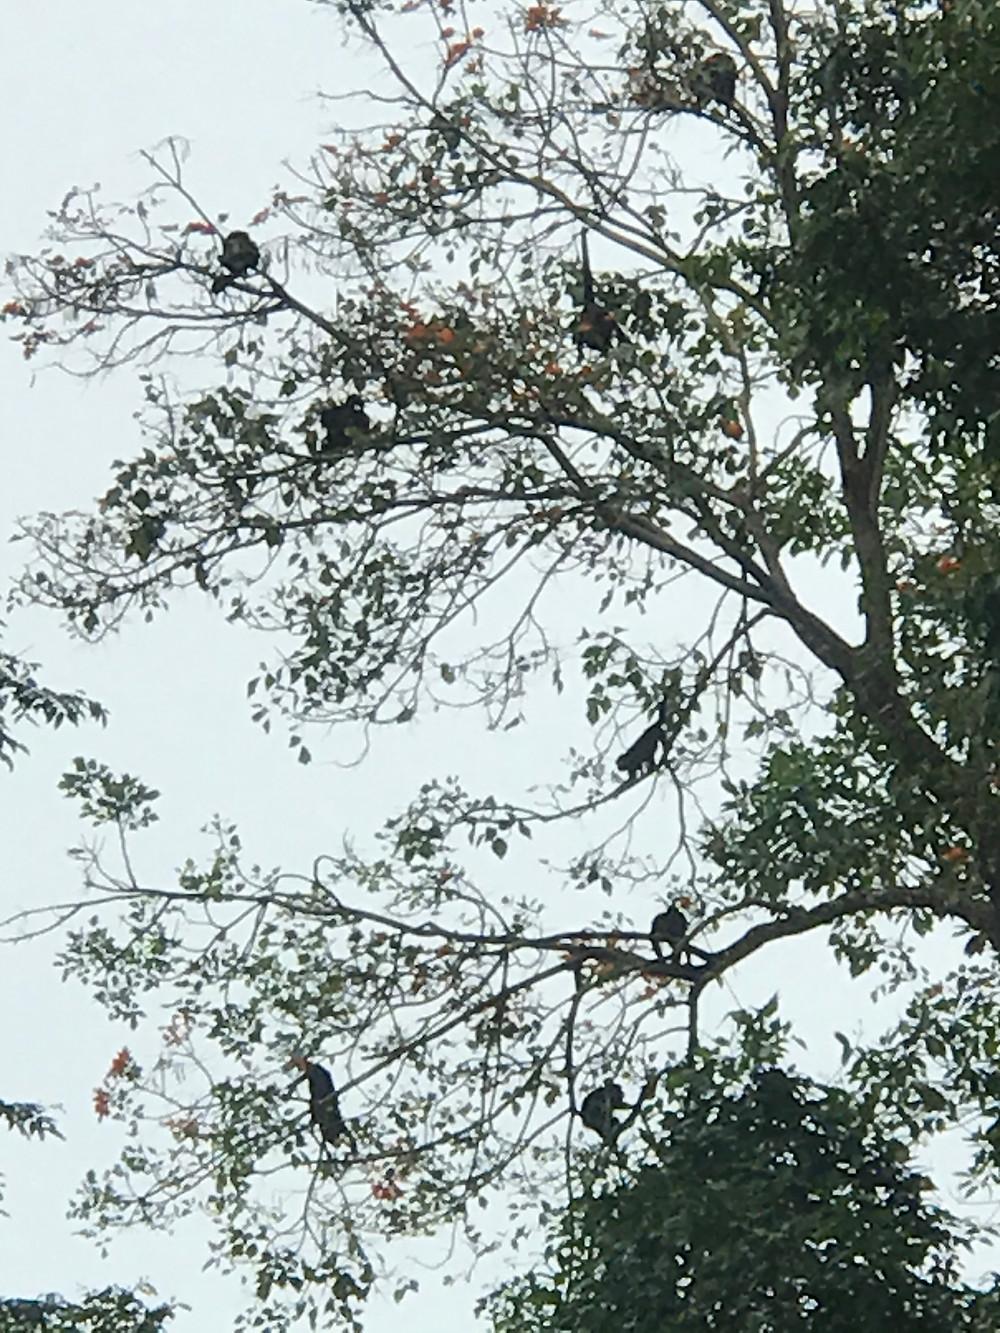 How many monkeys do you see?